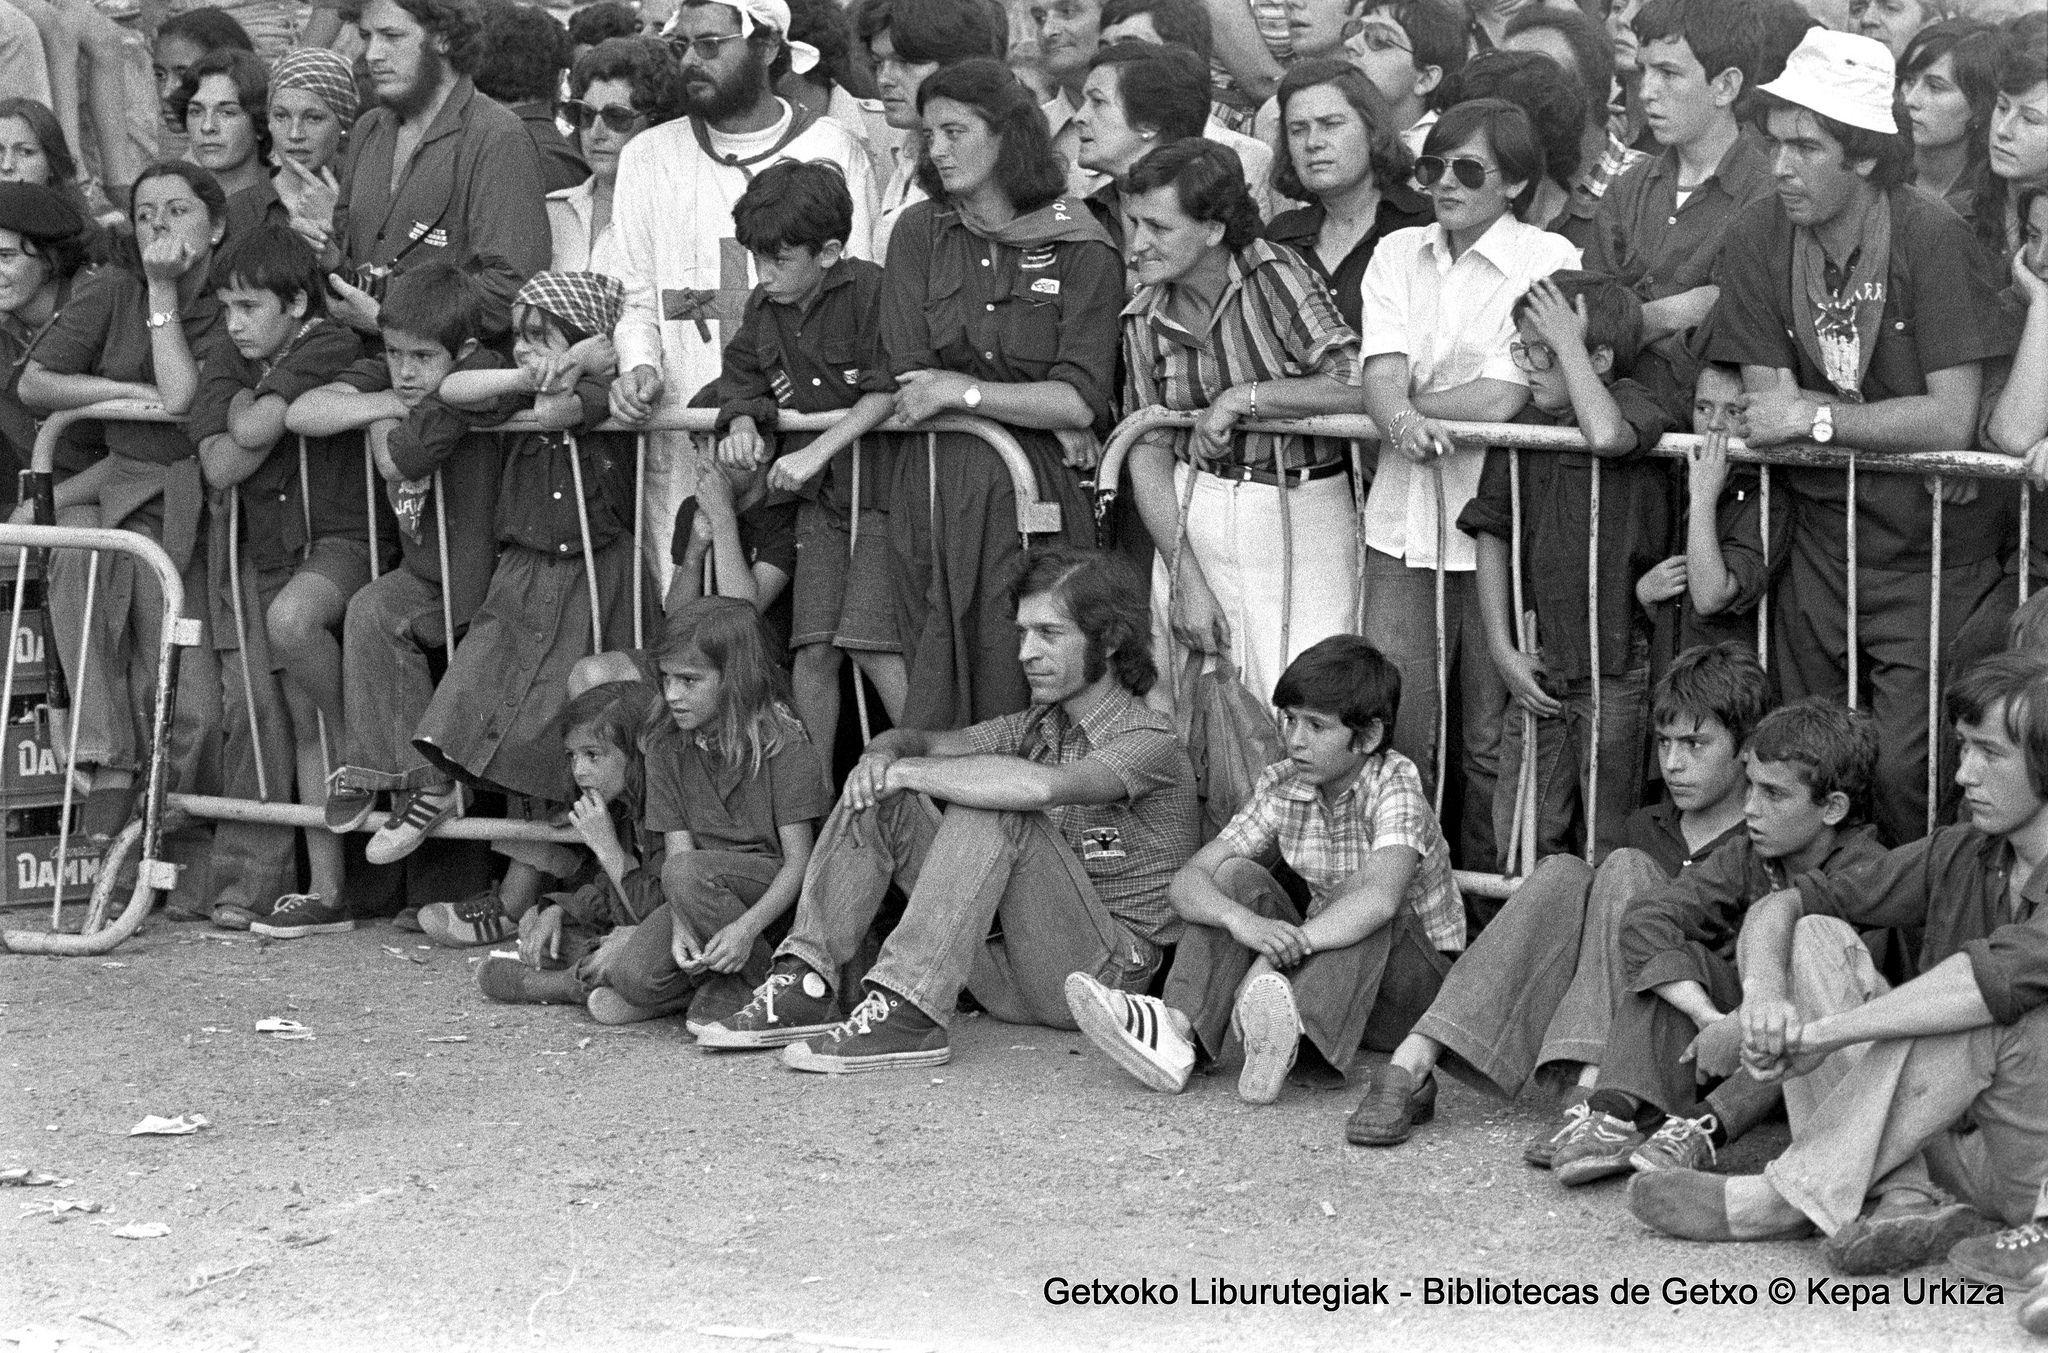 Portu Zaharreko jaiak / Fiestas del Puerto Viejo, 1977 (Colección Kepa Urkiza) (ref. KU03138)